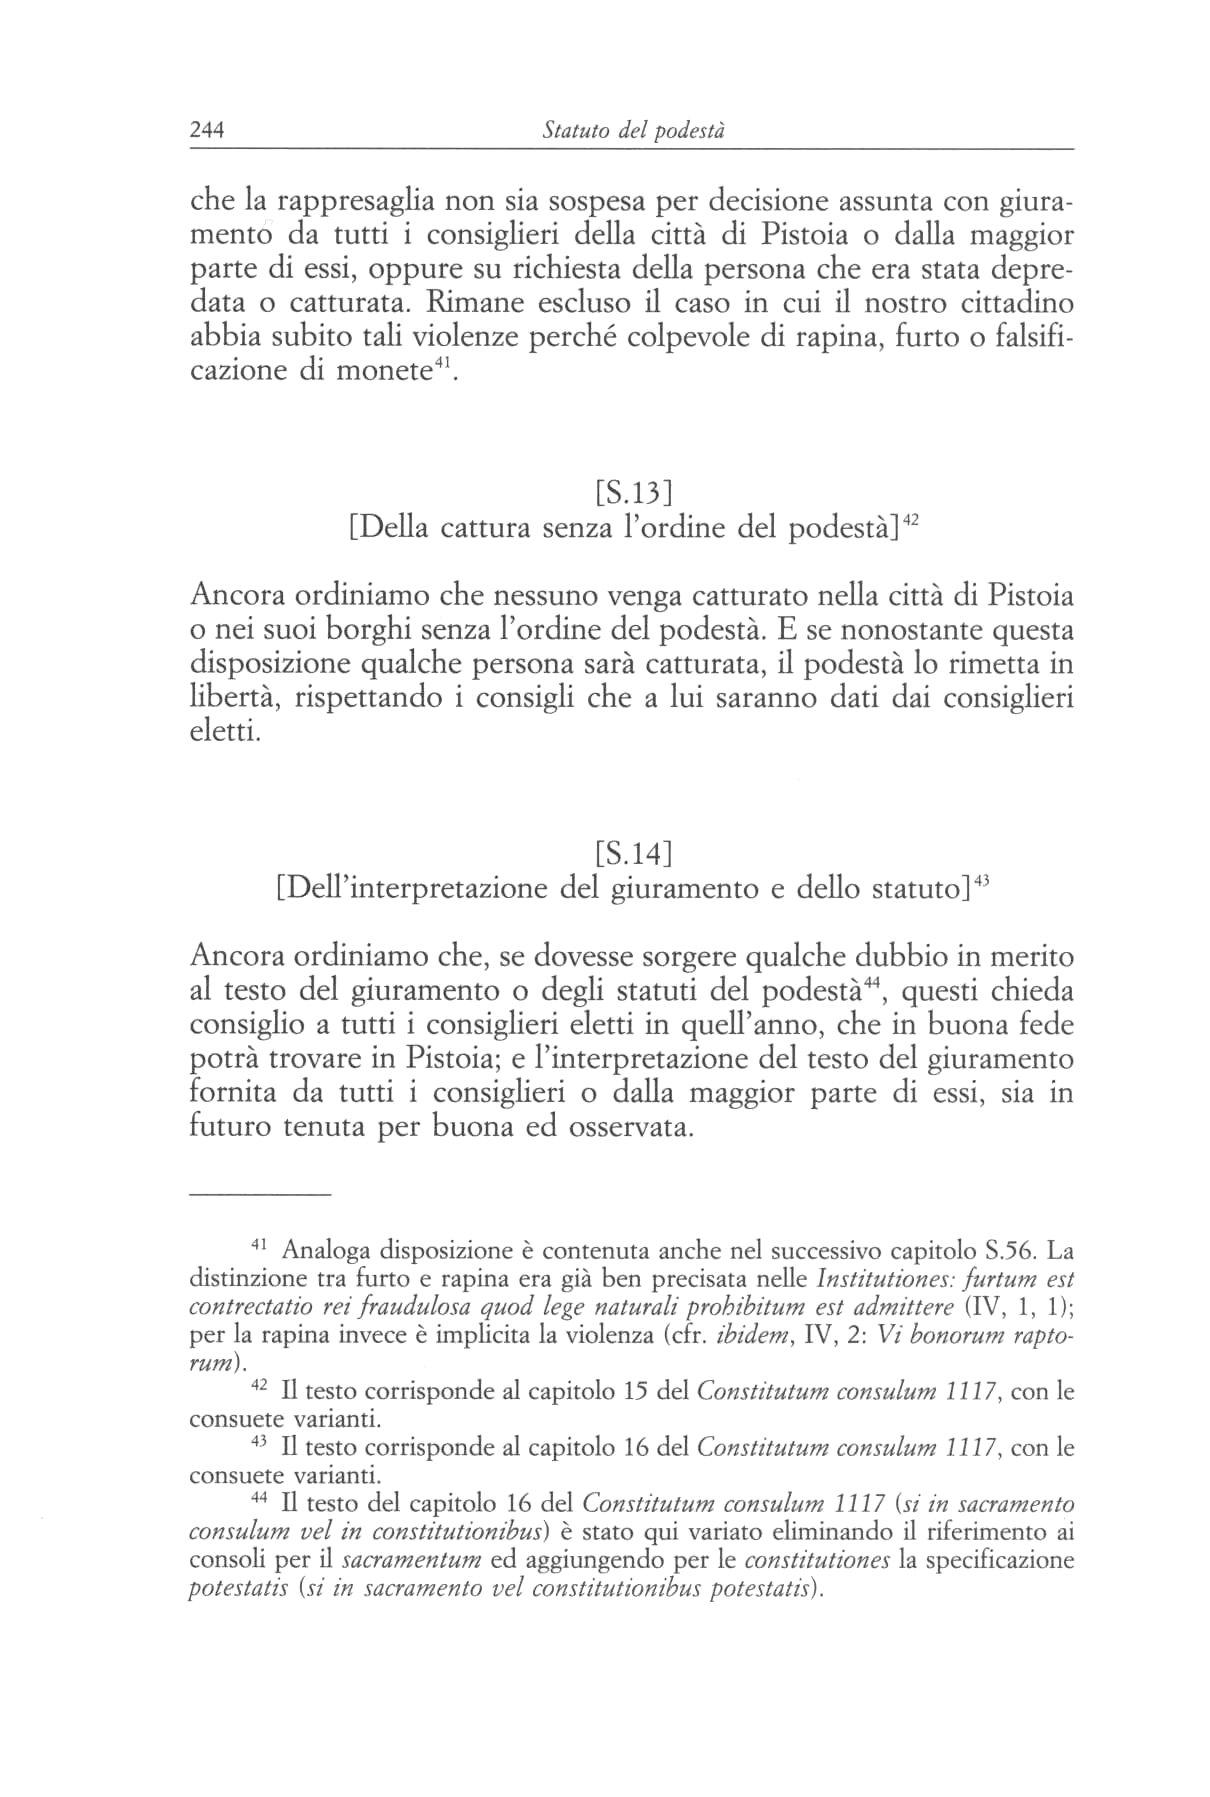 statuti pistoiesi del sec.XII 0244.jpg